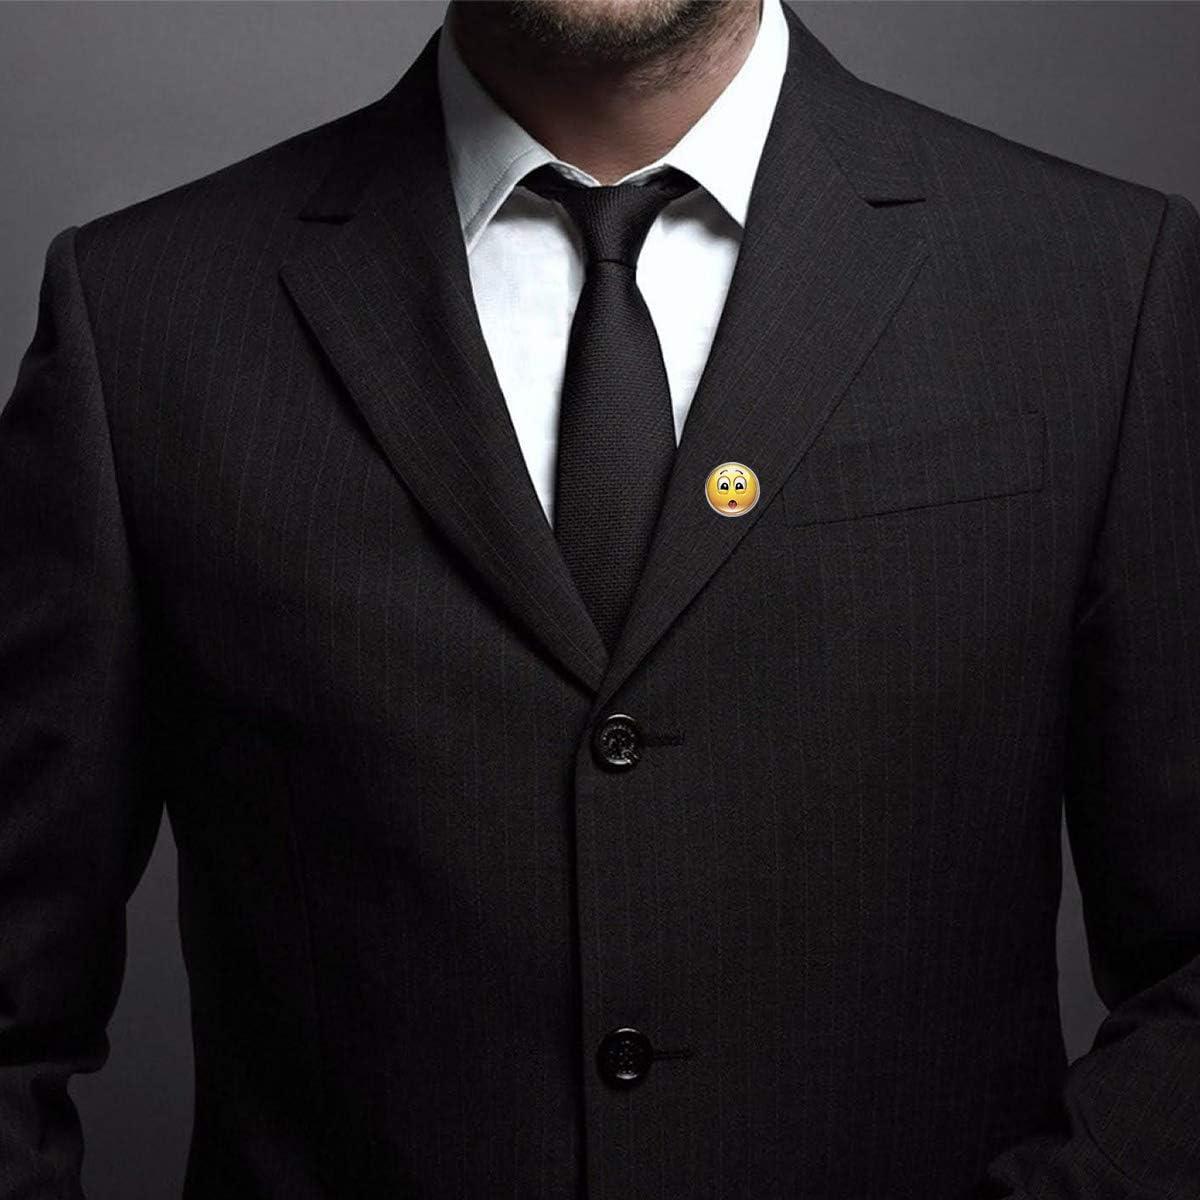 WAZZIT Round Metal Tie Tack Hat Lapel Pin Brooches Emoji Face Poor Sick Banquet Badge Enamel Pins Trendy Accessory Jacket T-Shirt